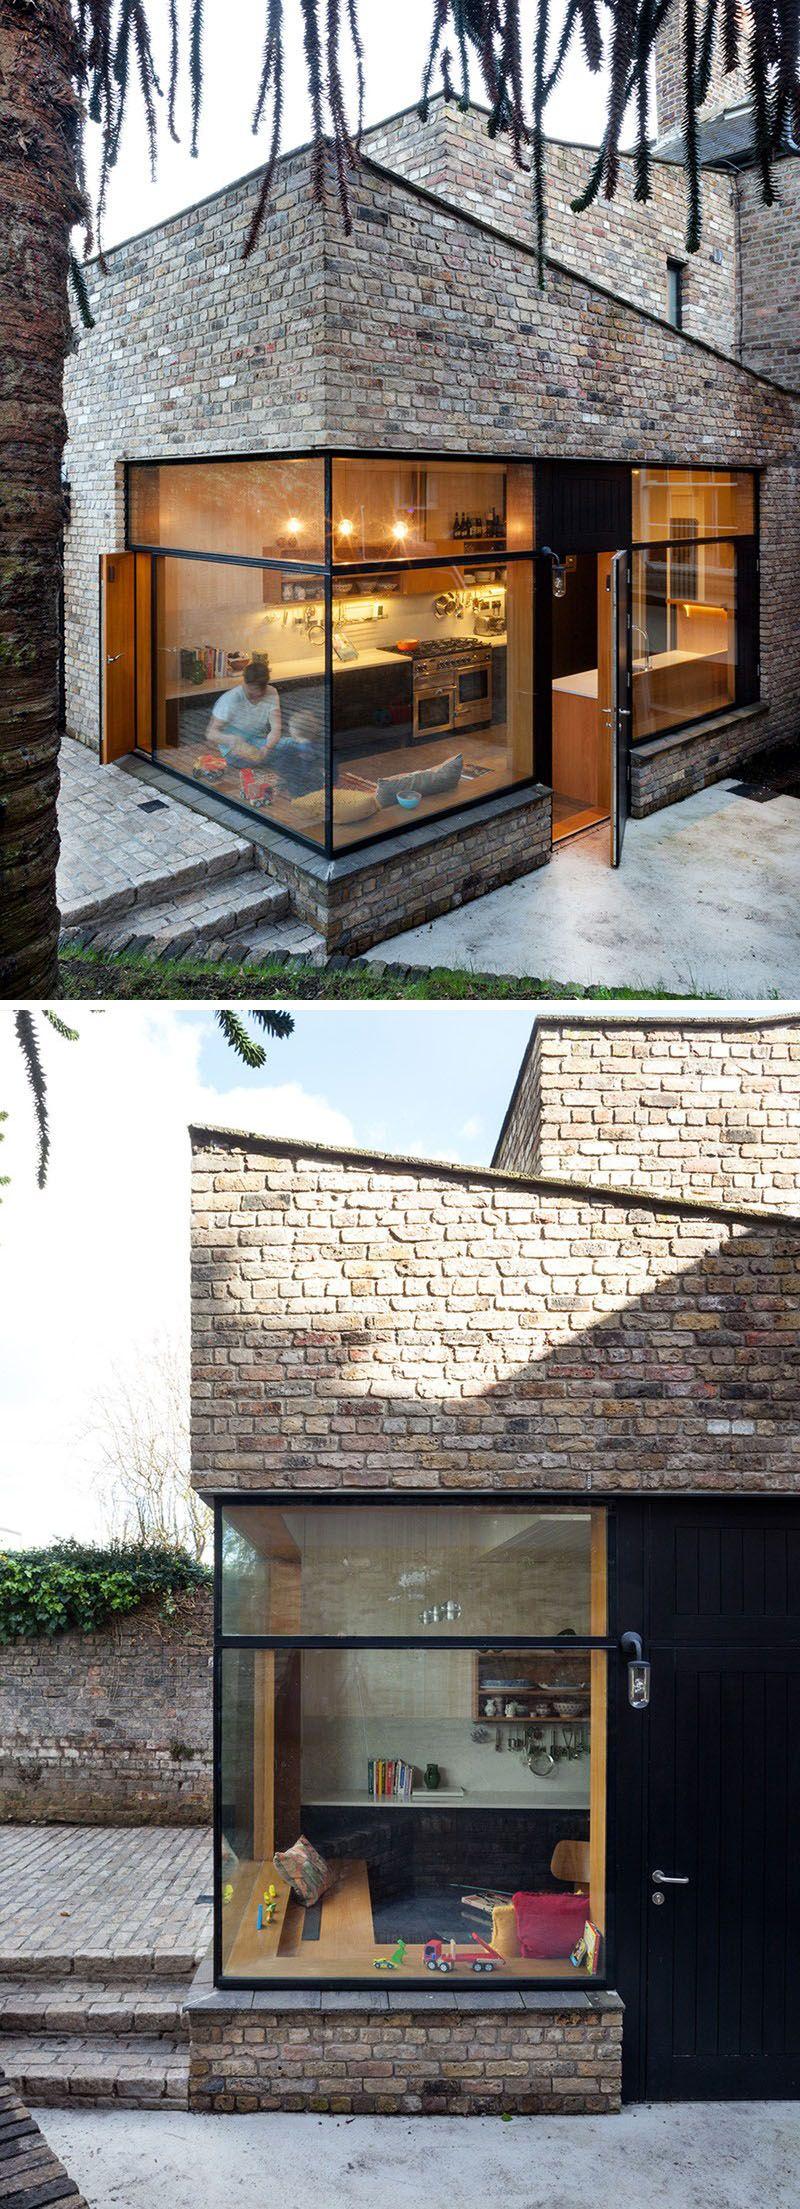 modern houses made of brick brick exteriors natural light and